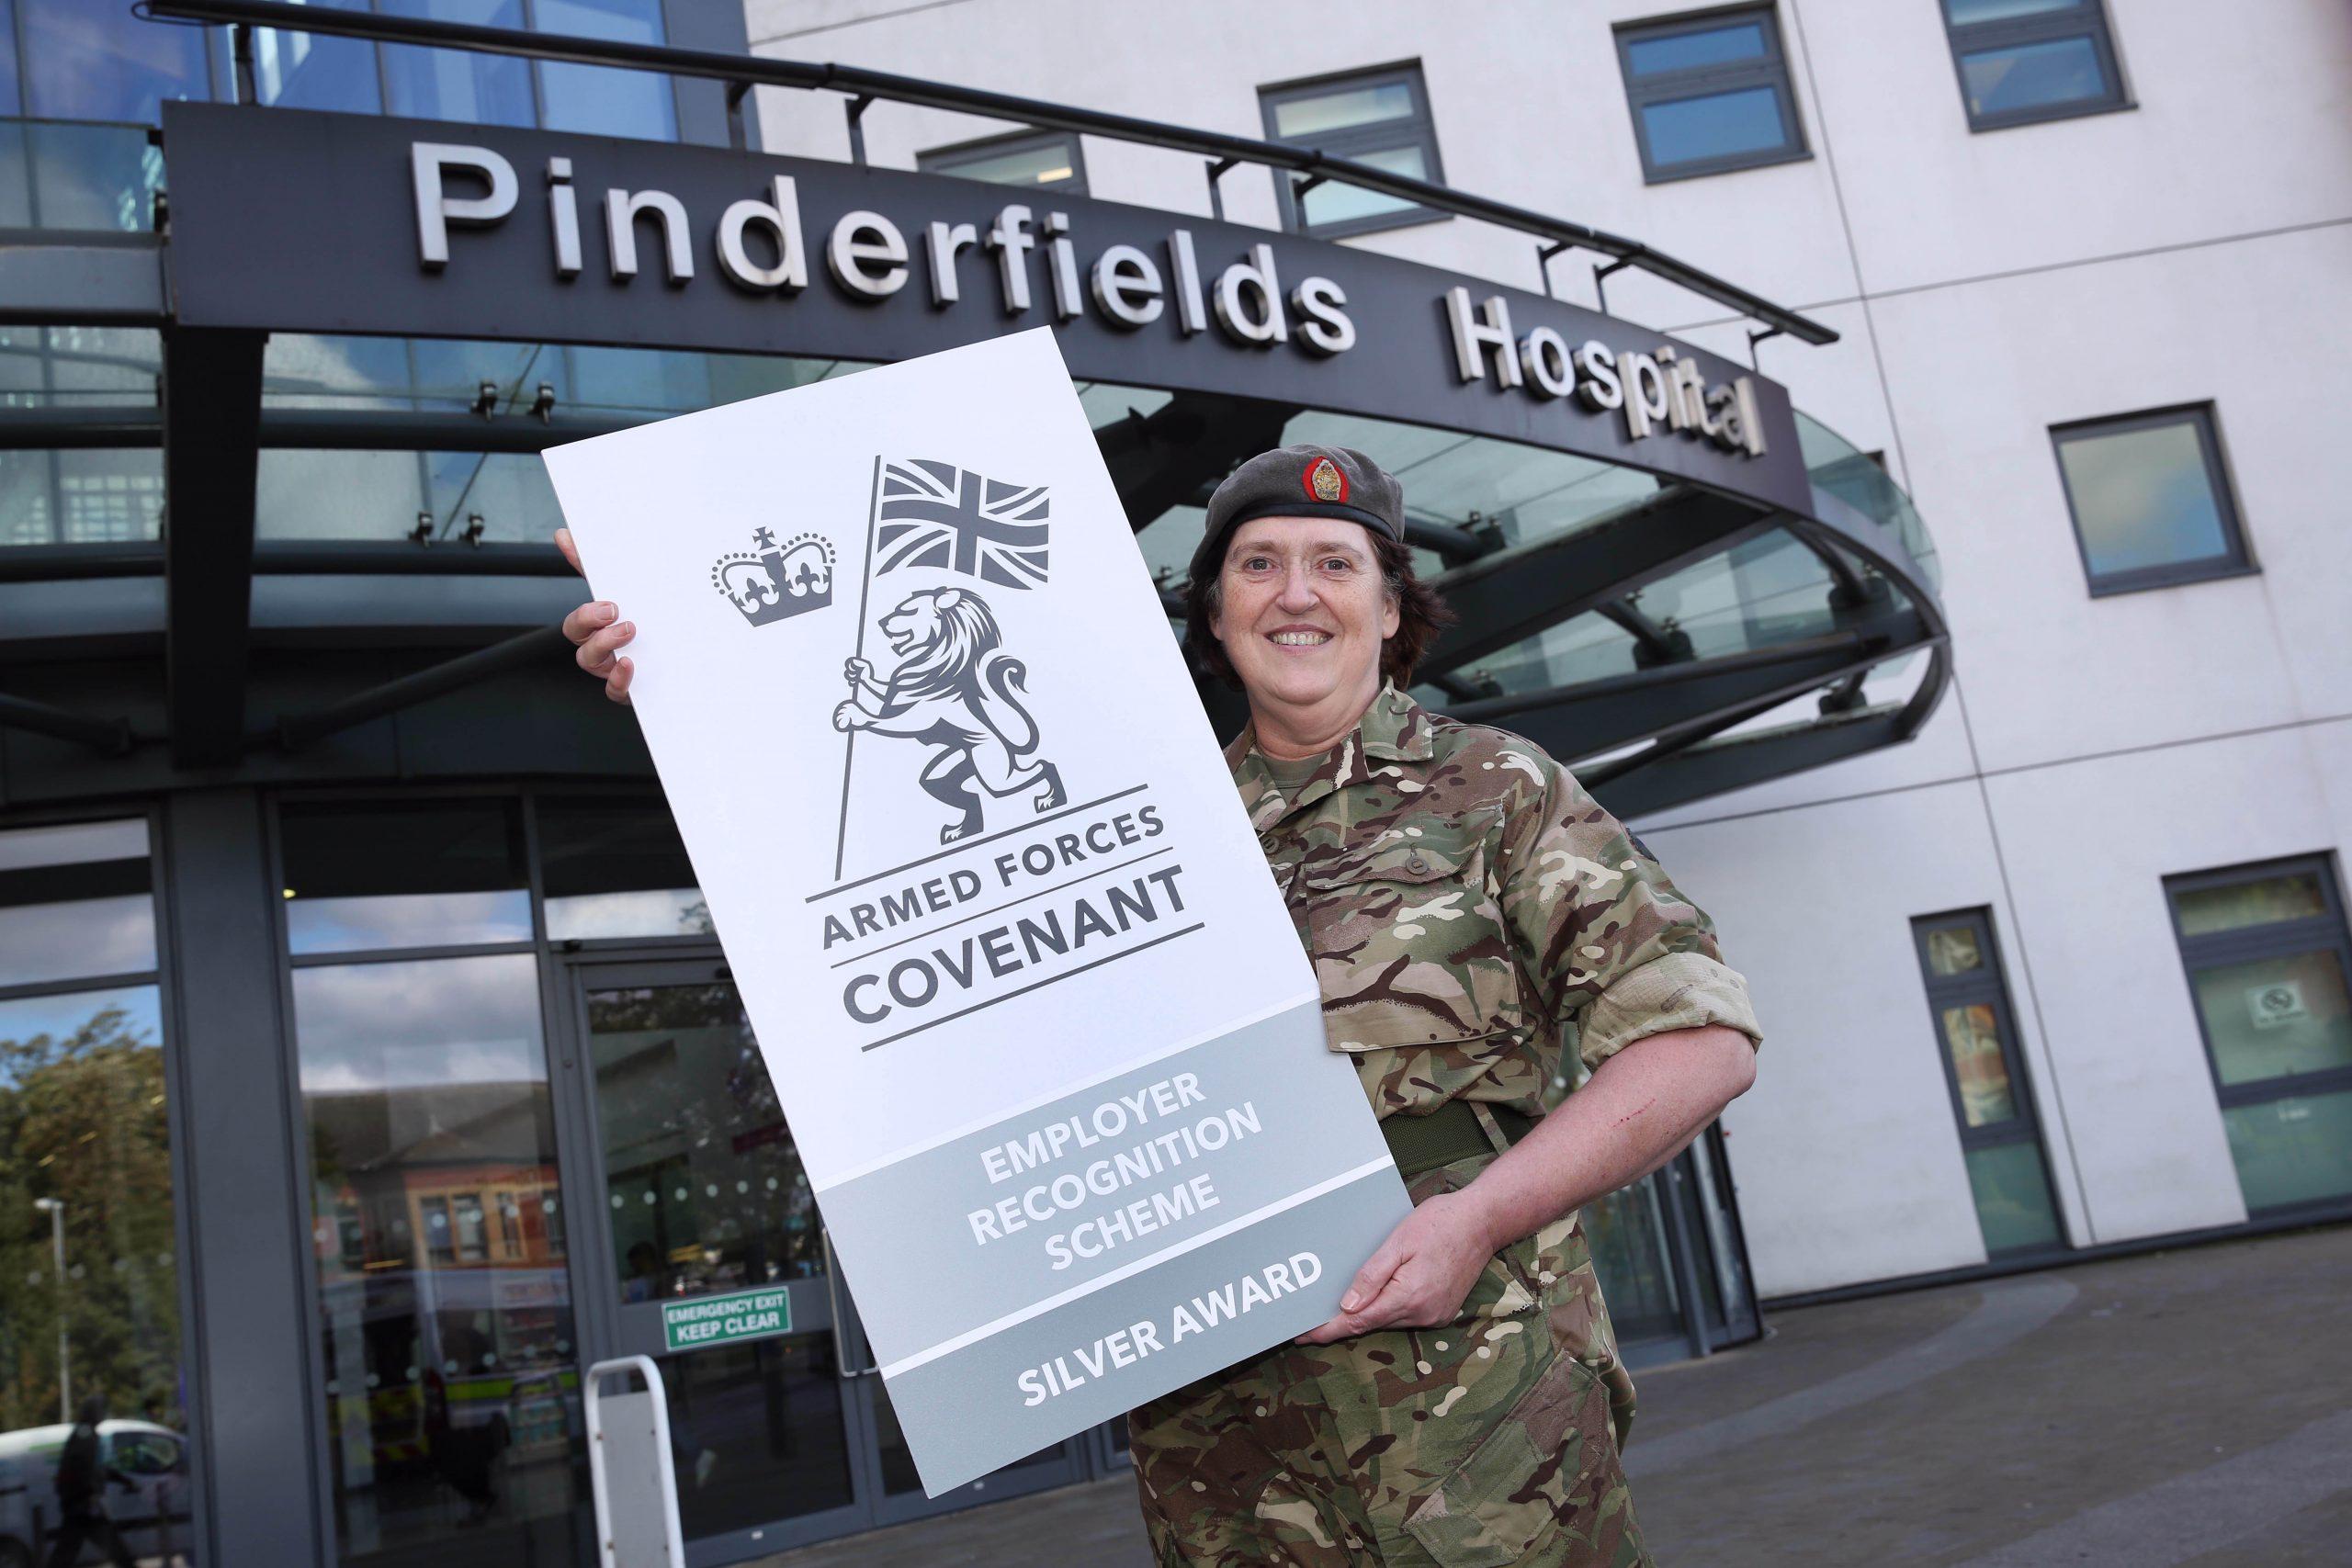 Reservist Carine Horsburgh from Pinderfields Hospital